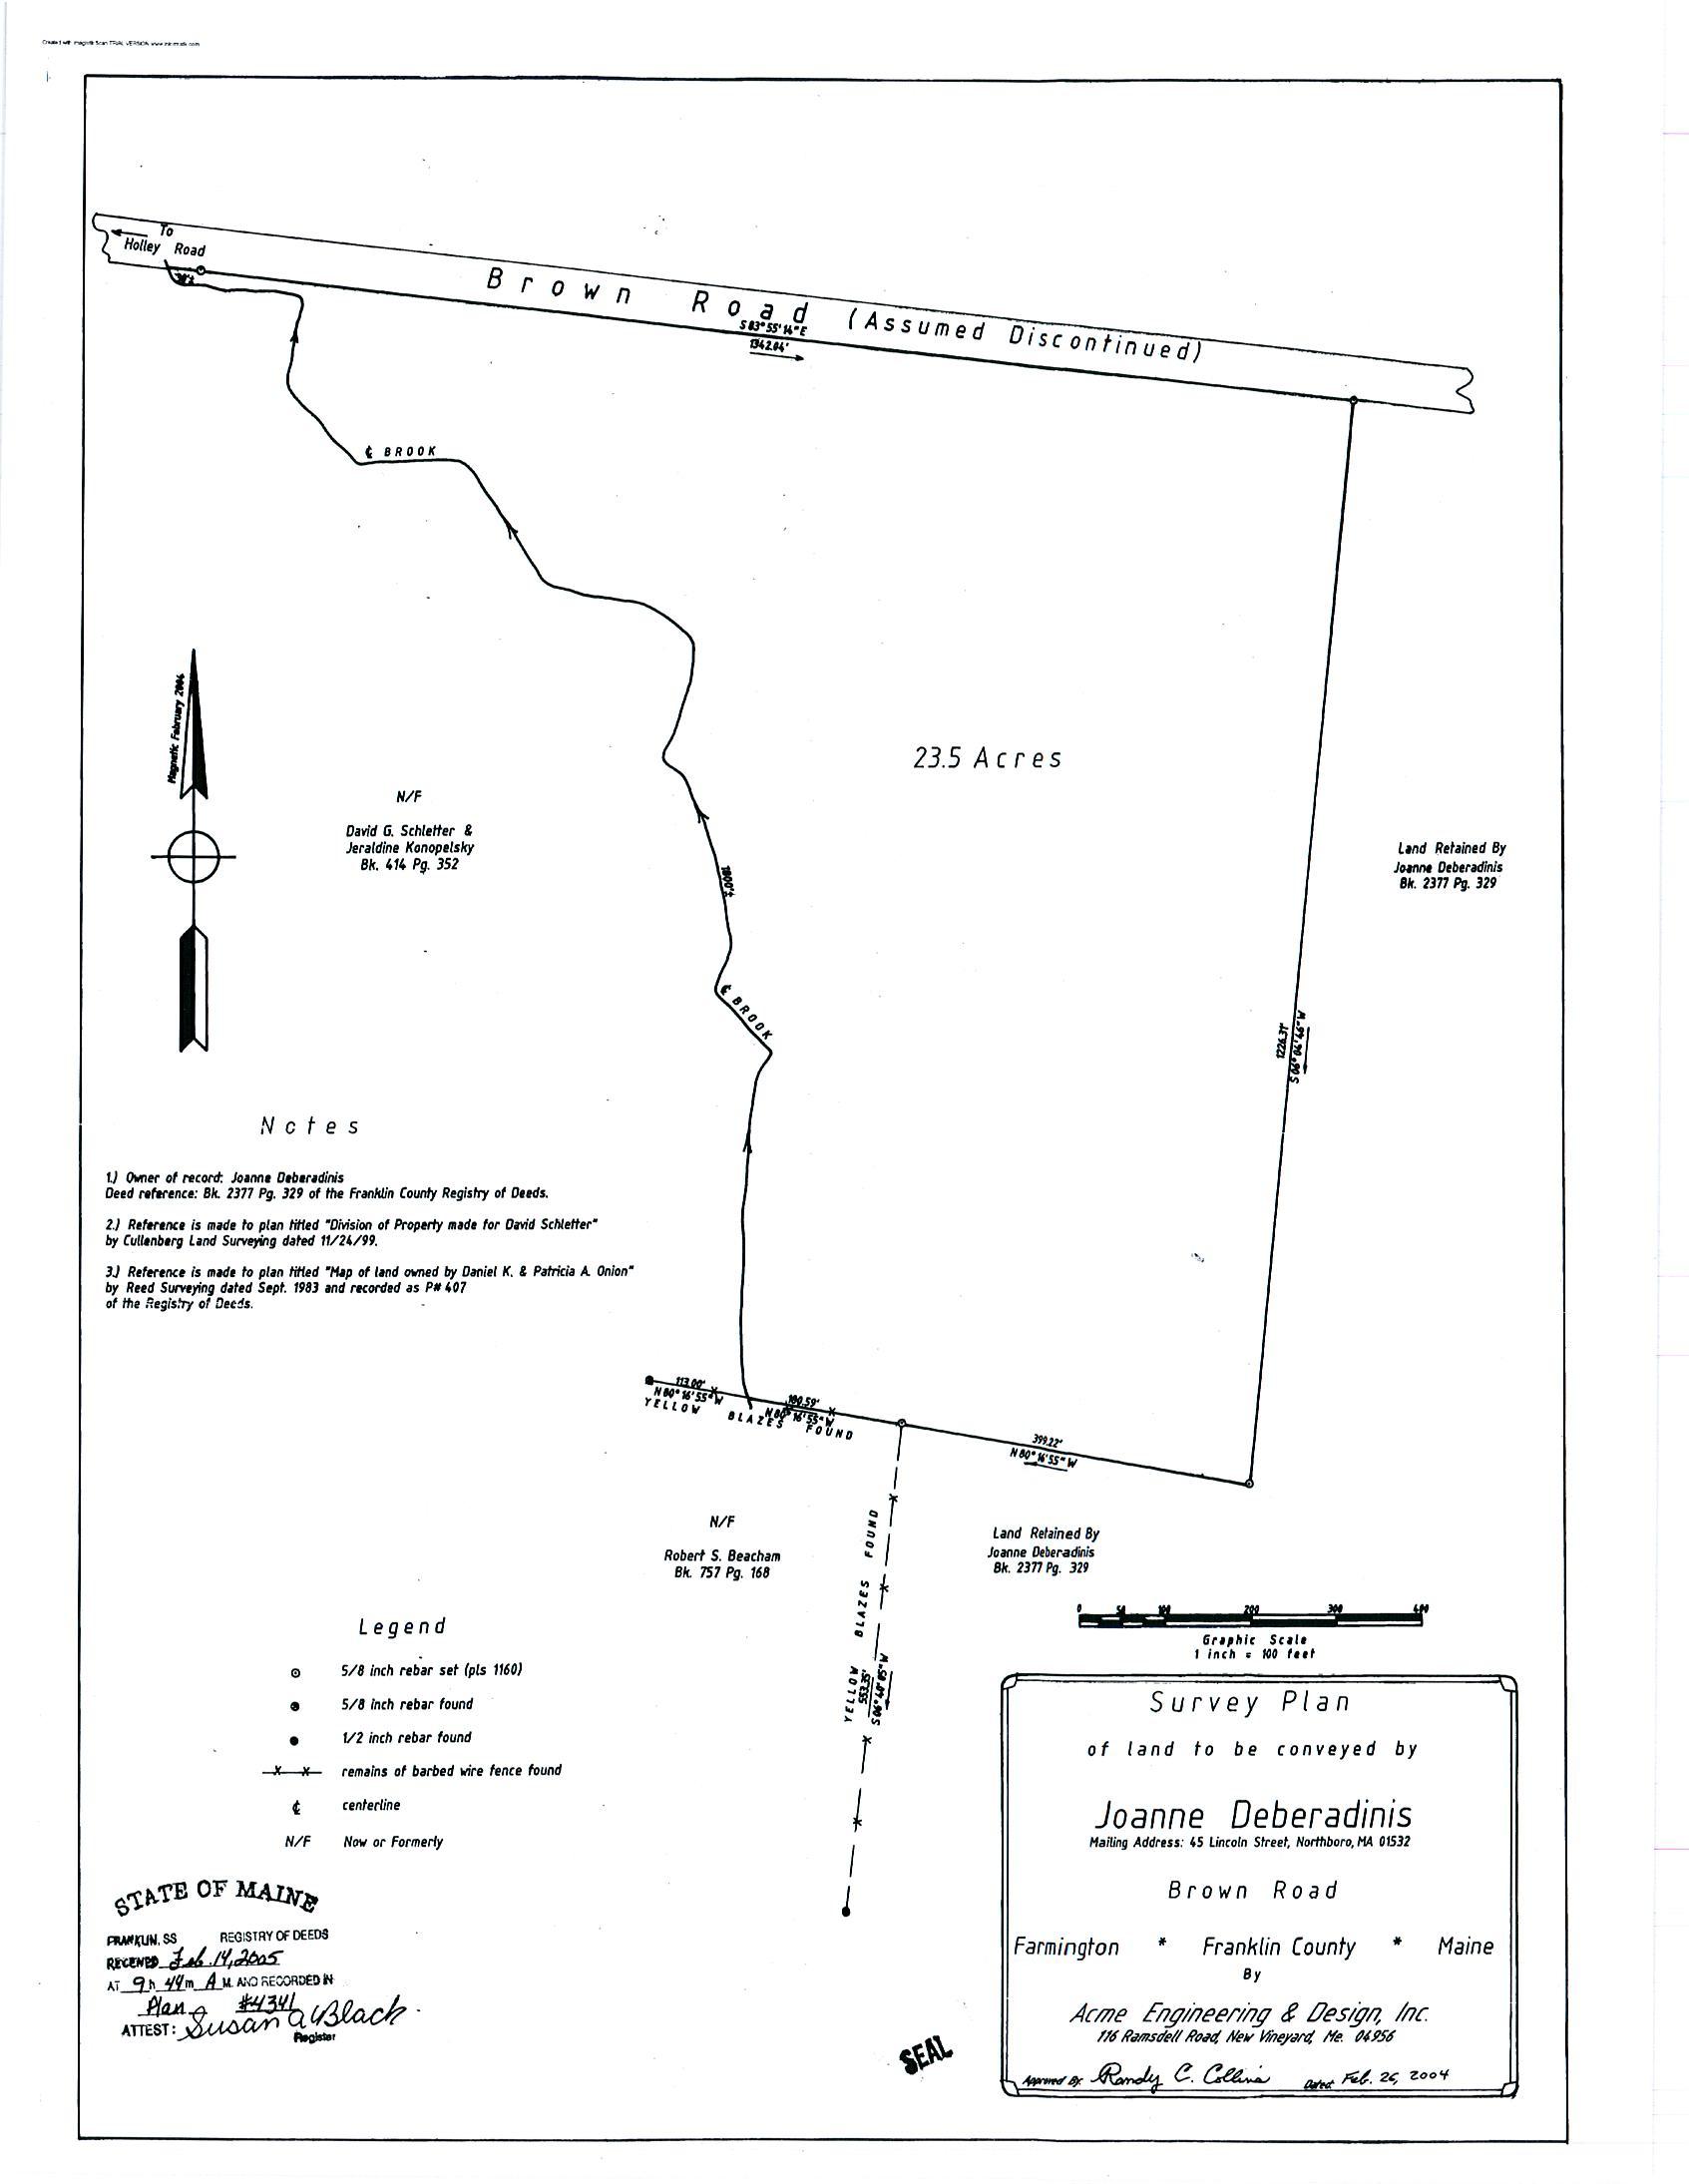 000 Brown Road, Farmington, Maine 04938